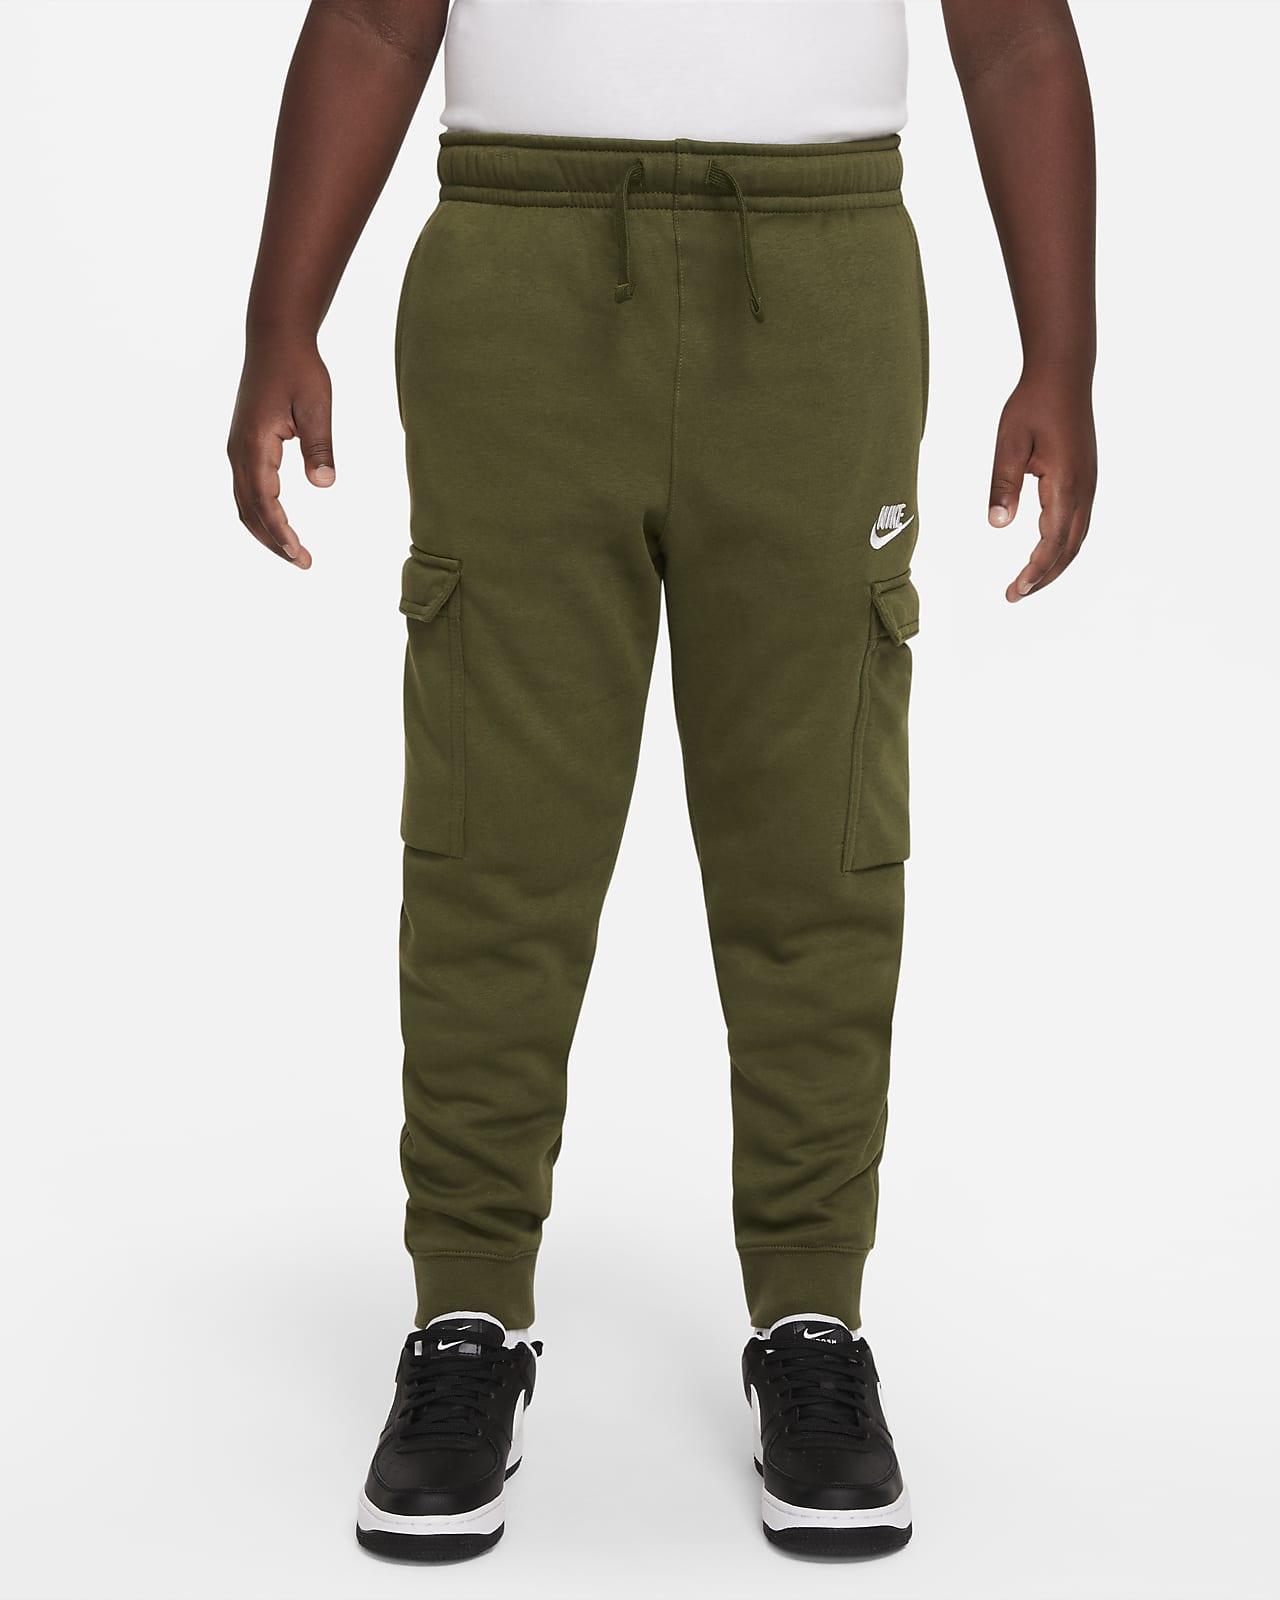 Calças cargo Nike Sportswear Club Júnior (Rapaz) (tamanhos grandes)